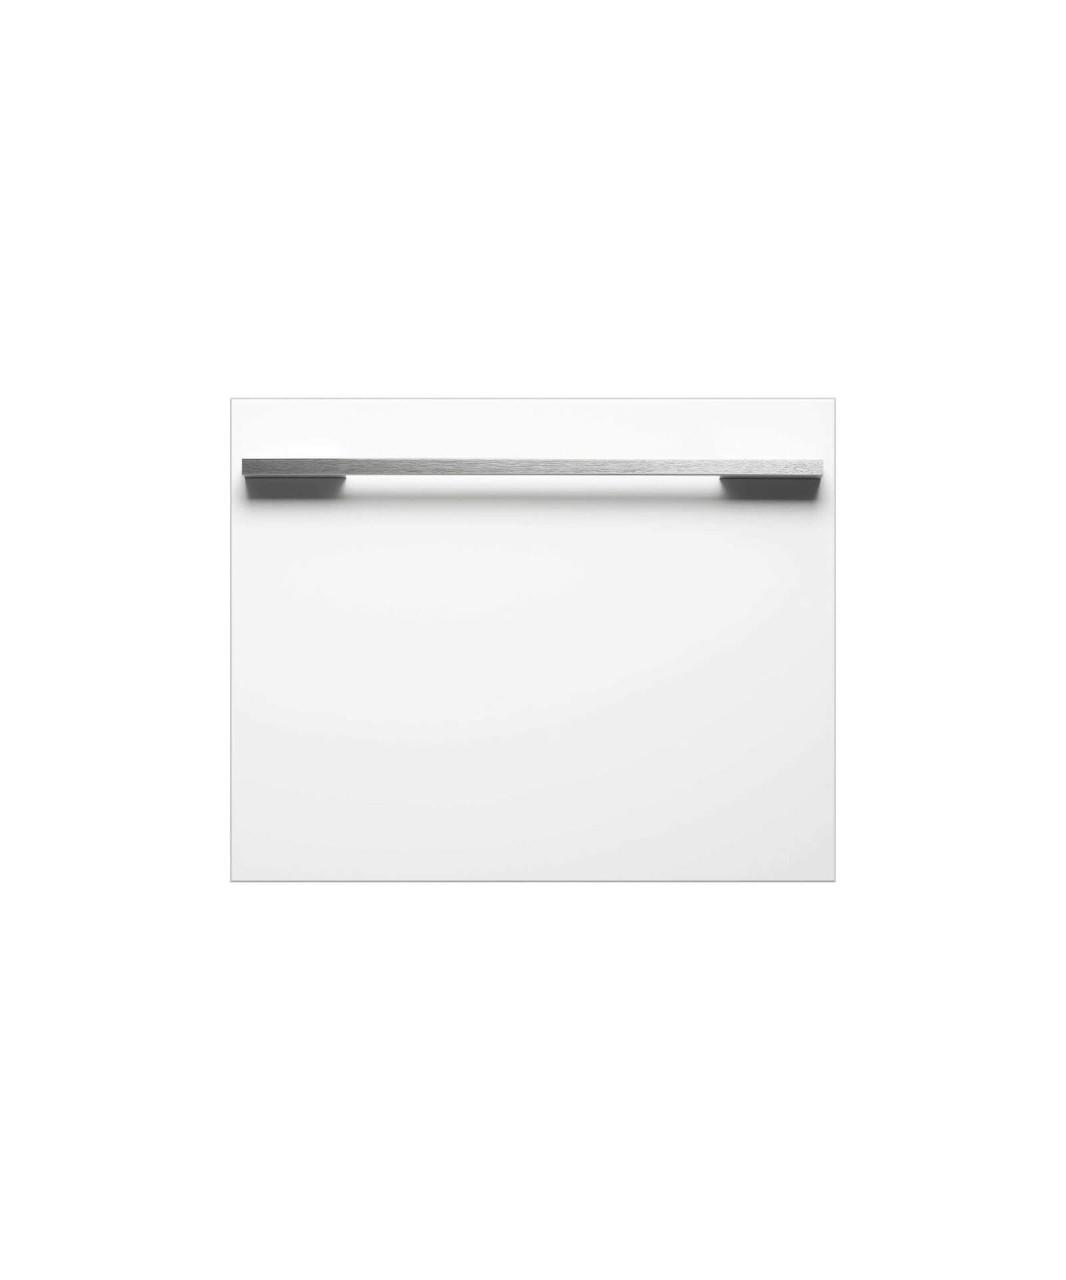 Tall Panel Ready Single DishDrawer dishwasher incl full flex racking